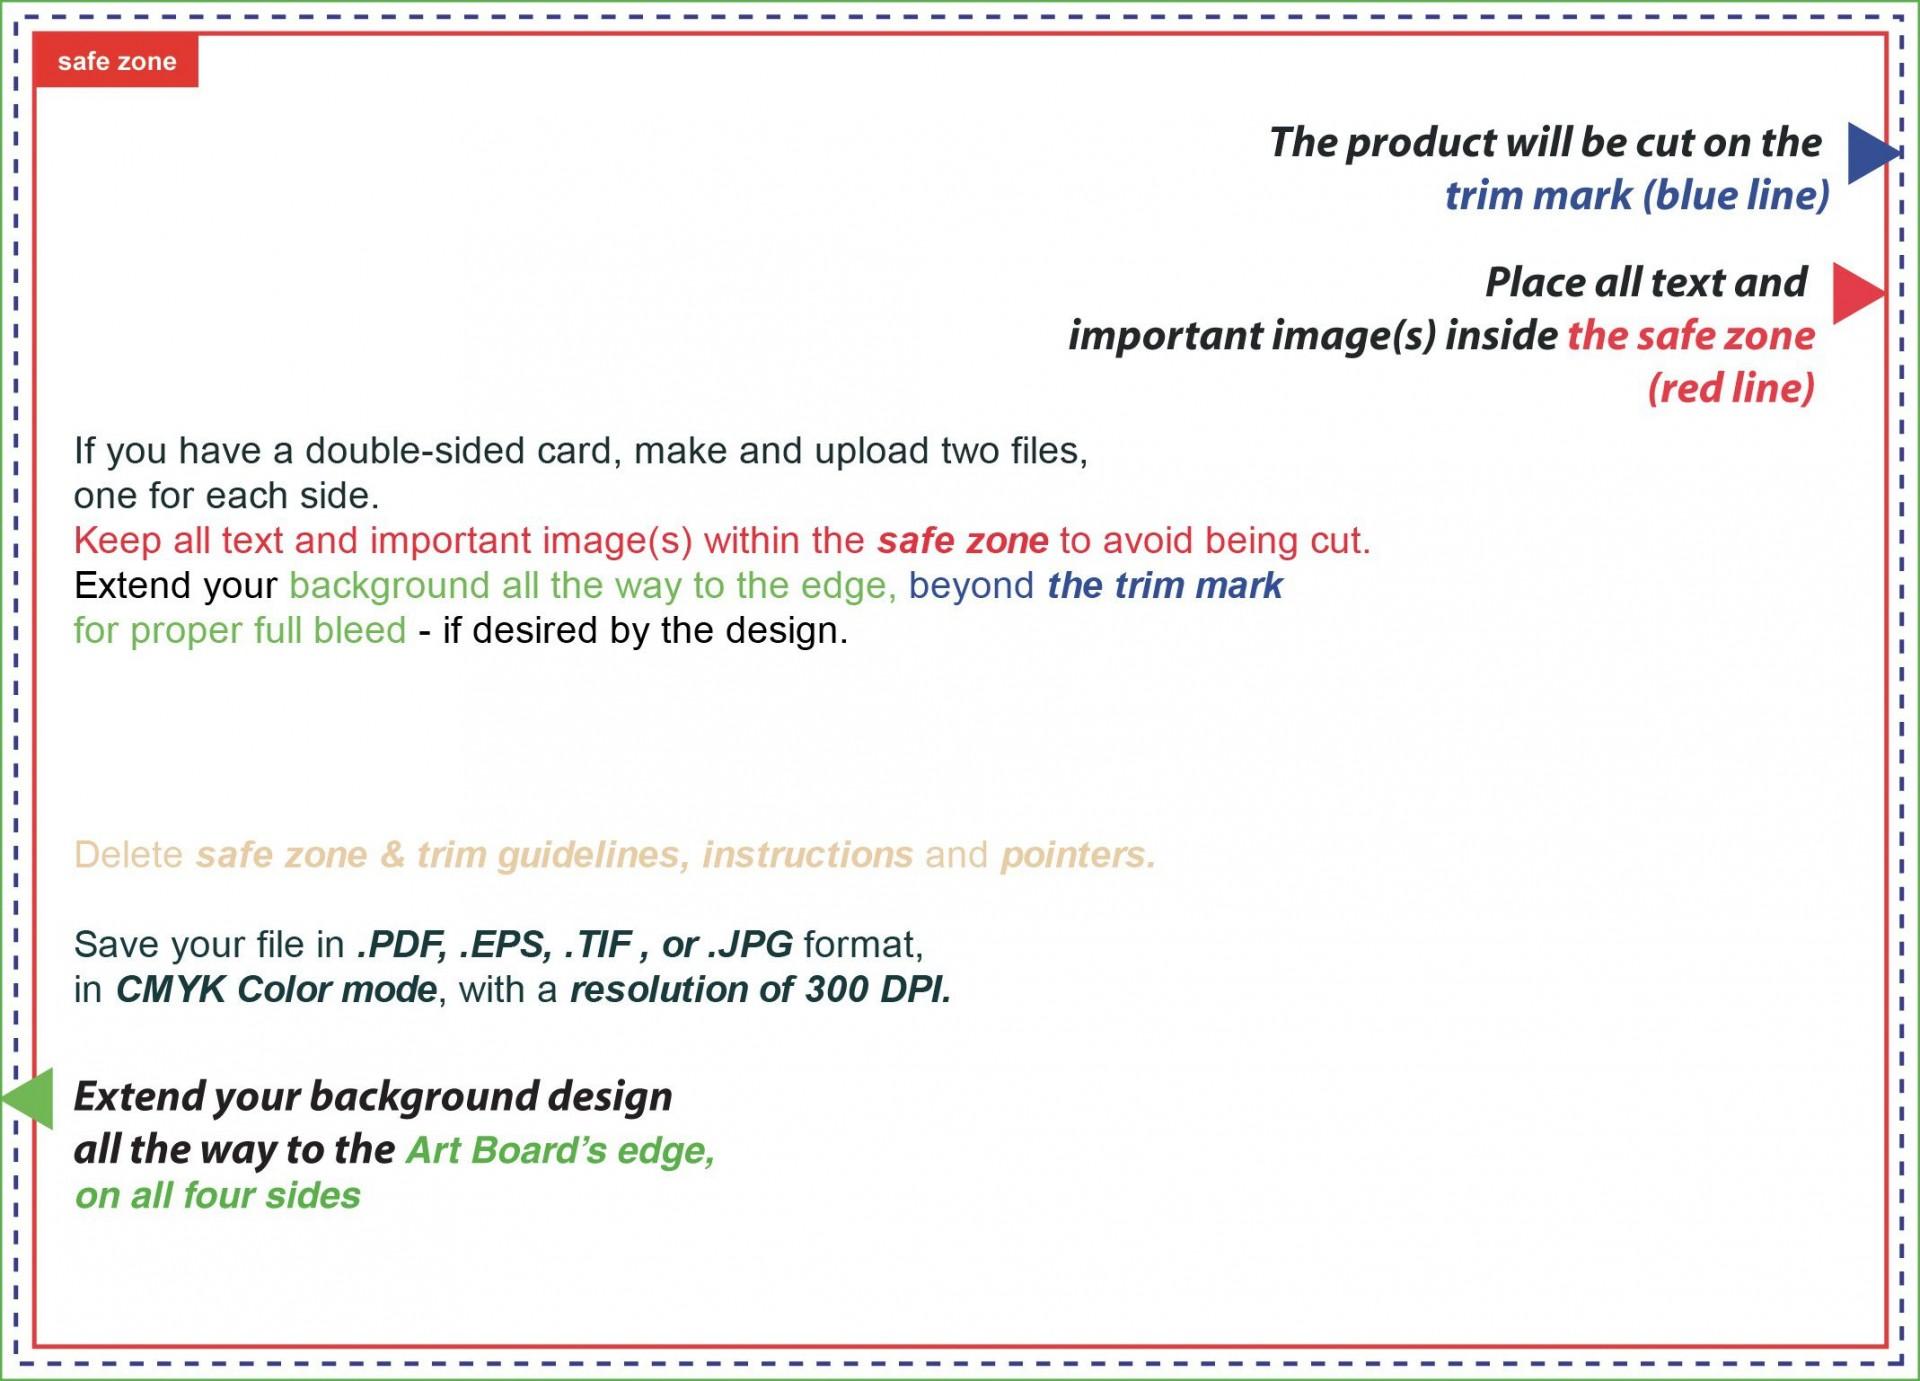 002 Outstanding 5 X 7 Postcard Template Microsoft Word Idea 1920